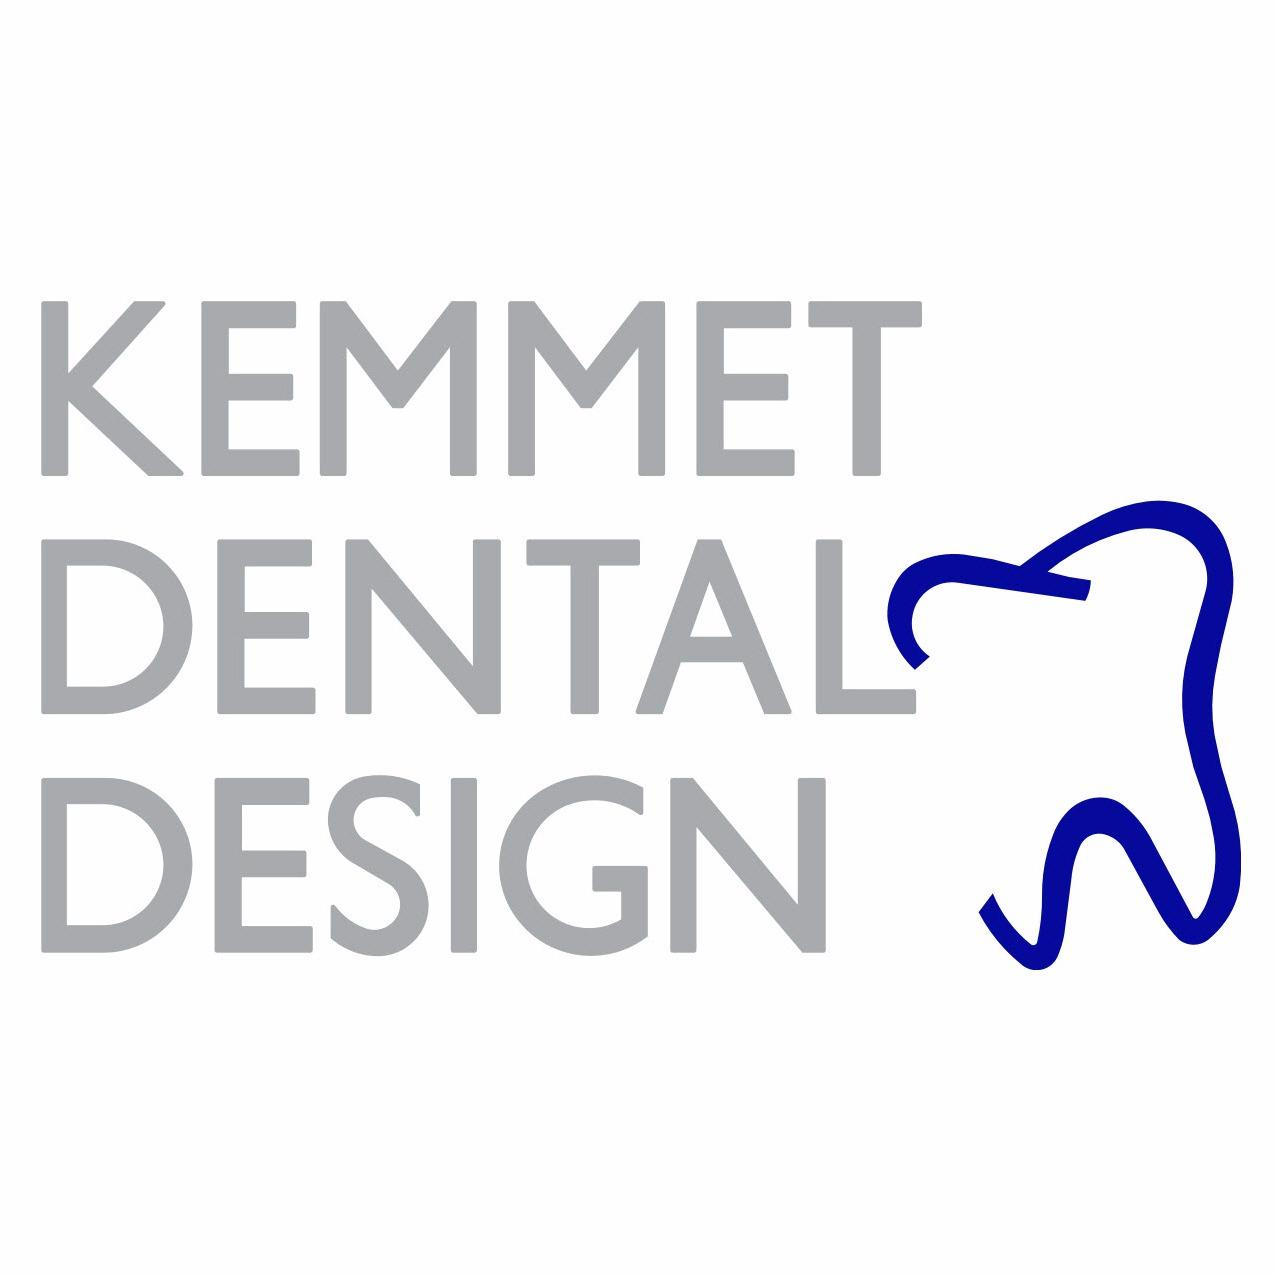 Kemmet Dental Design - Minot, ND 58701 - (701) 852-4789 | ShowMeLocal.com